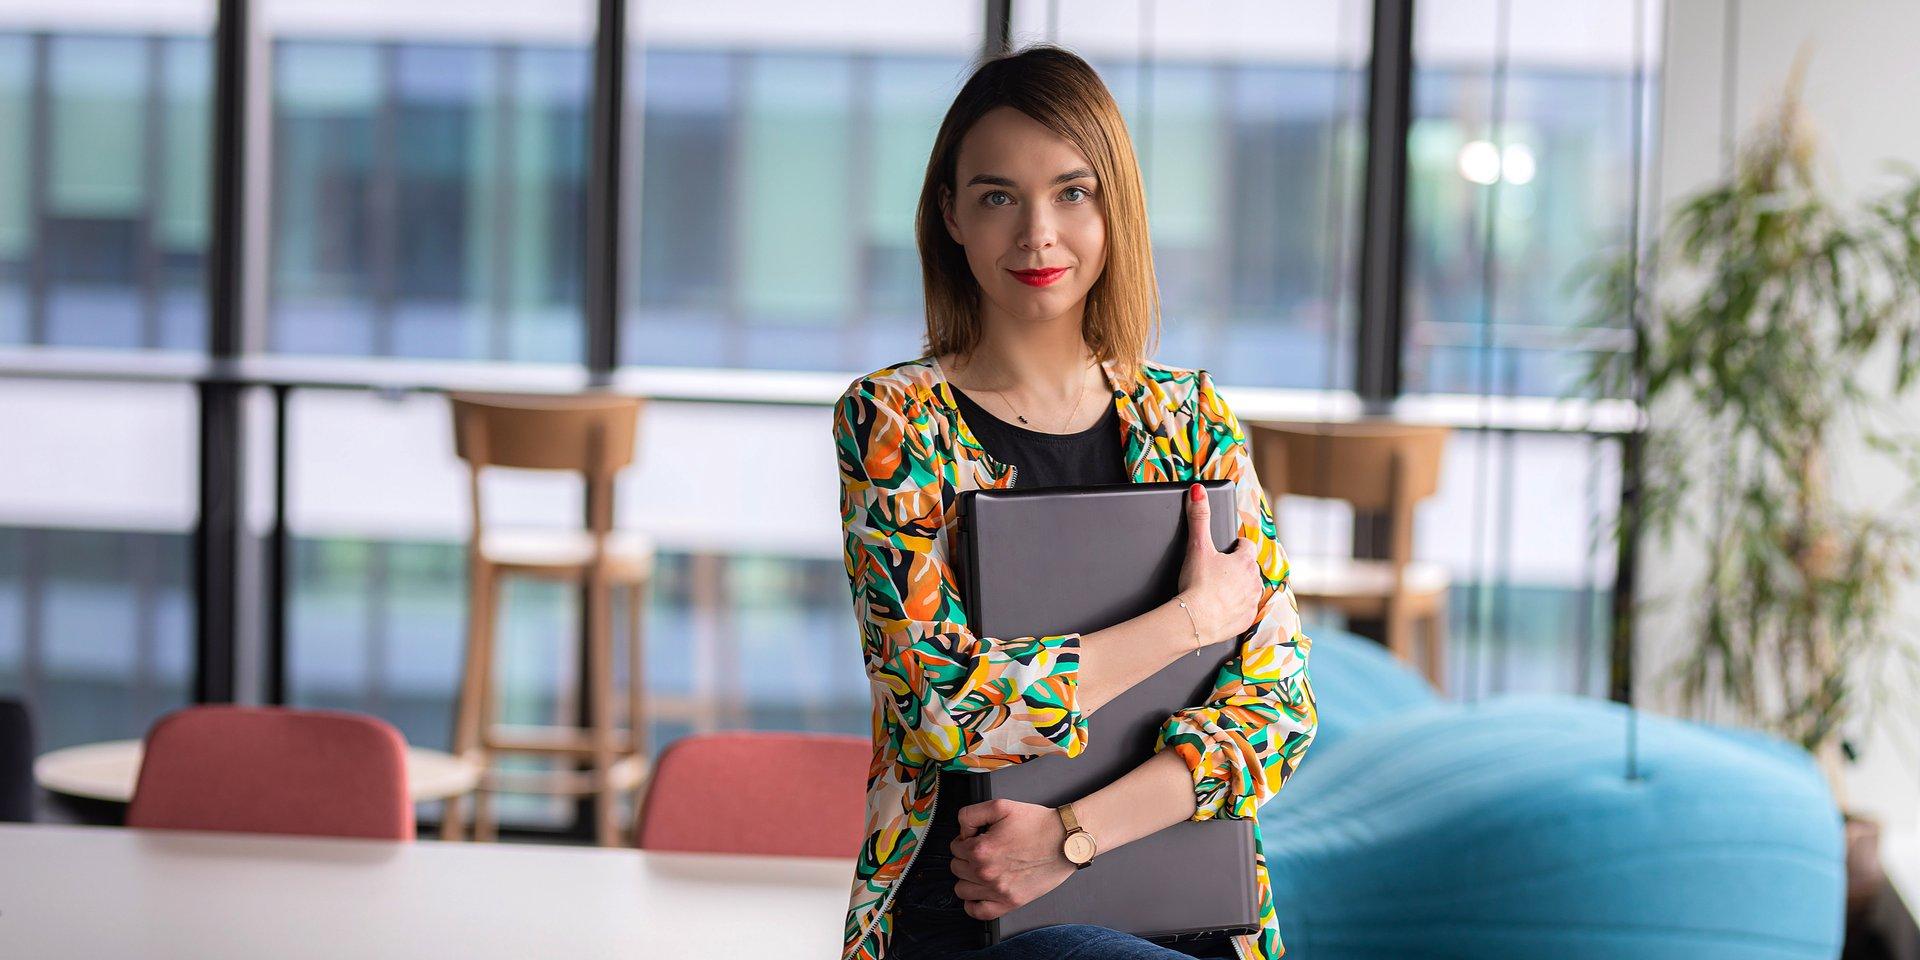 Julia Kałużyńska